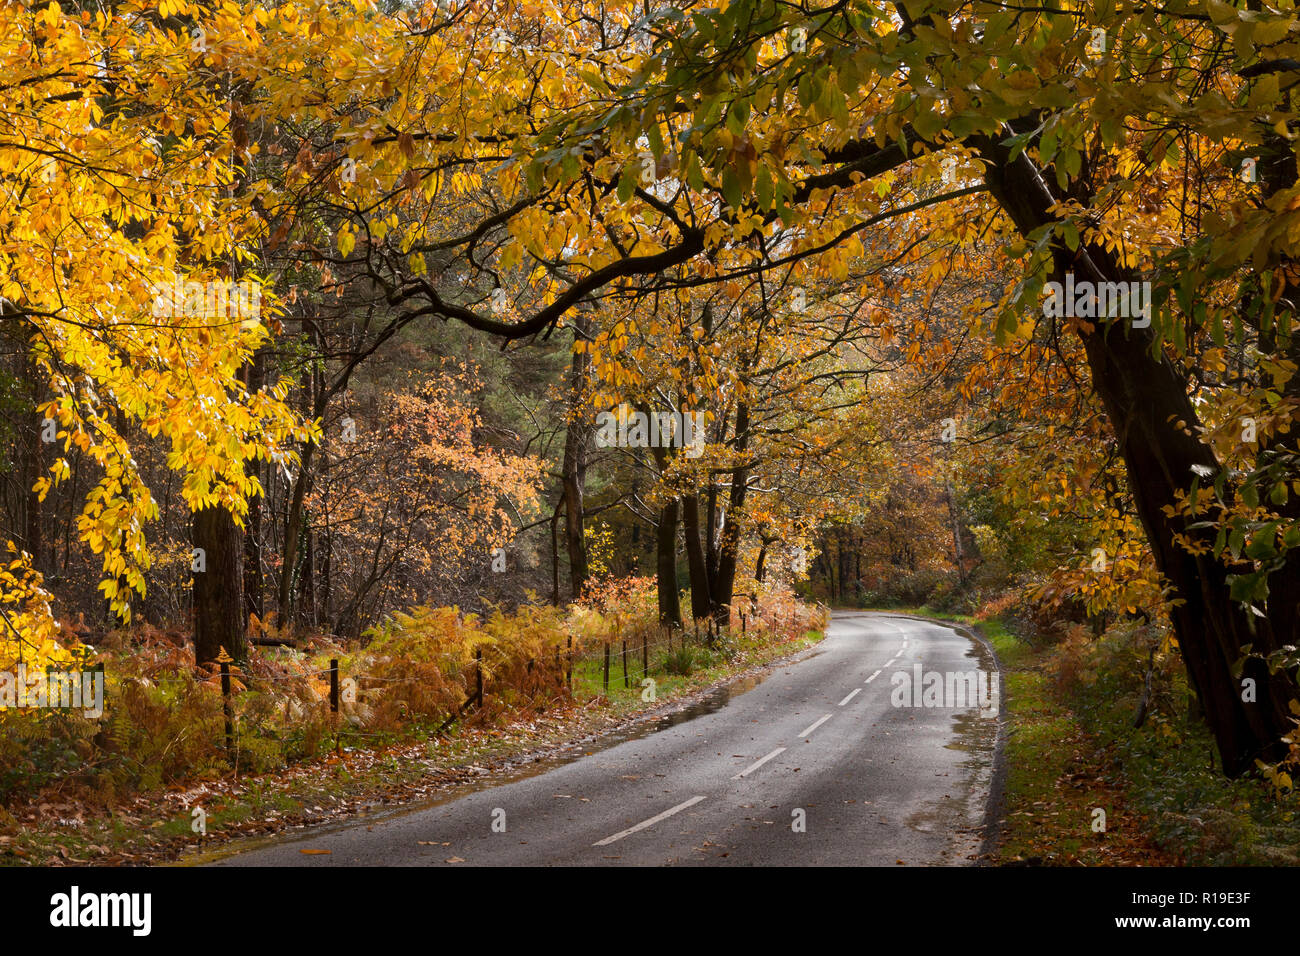 autumnal colours in Crooksbury woods on the road between Elstead & Seale, near Farnham & Godalming, Surrey, England Stock Photo